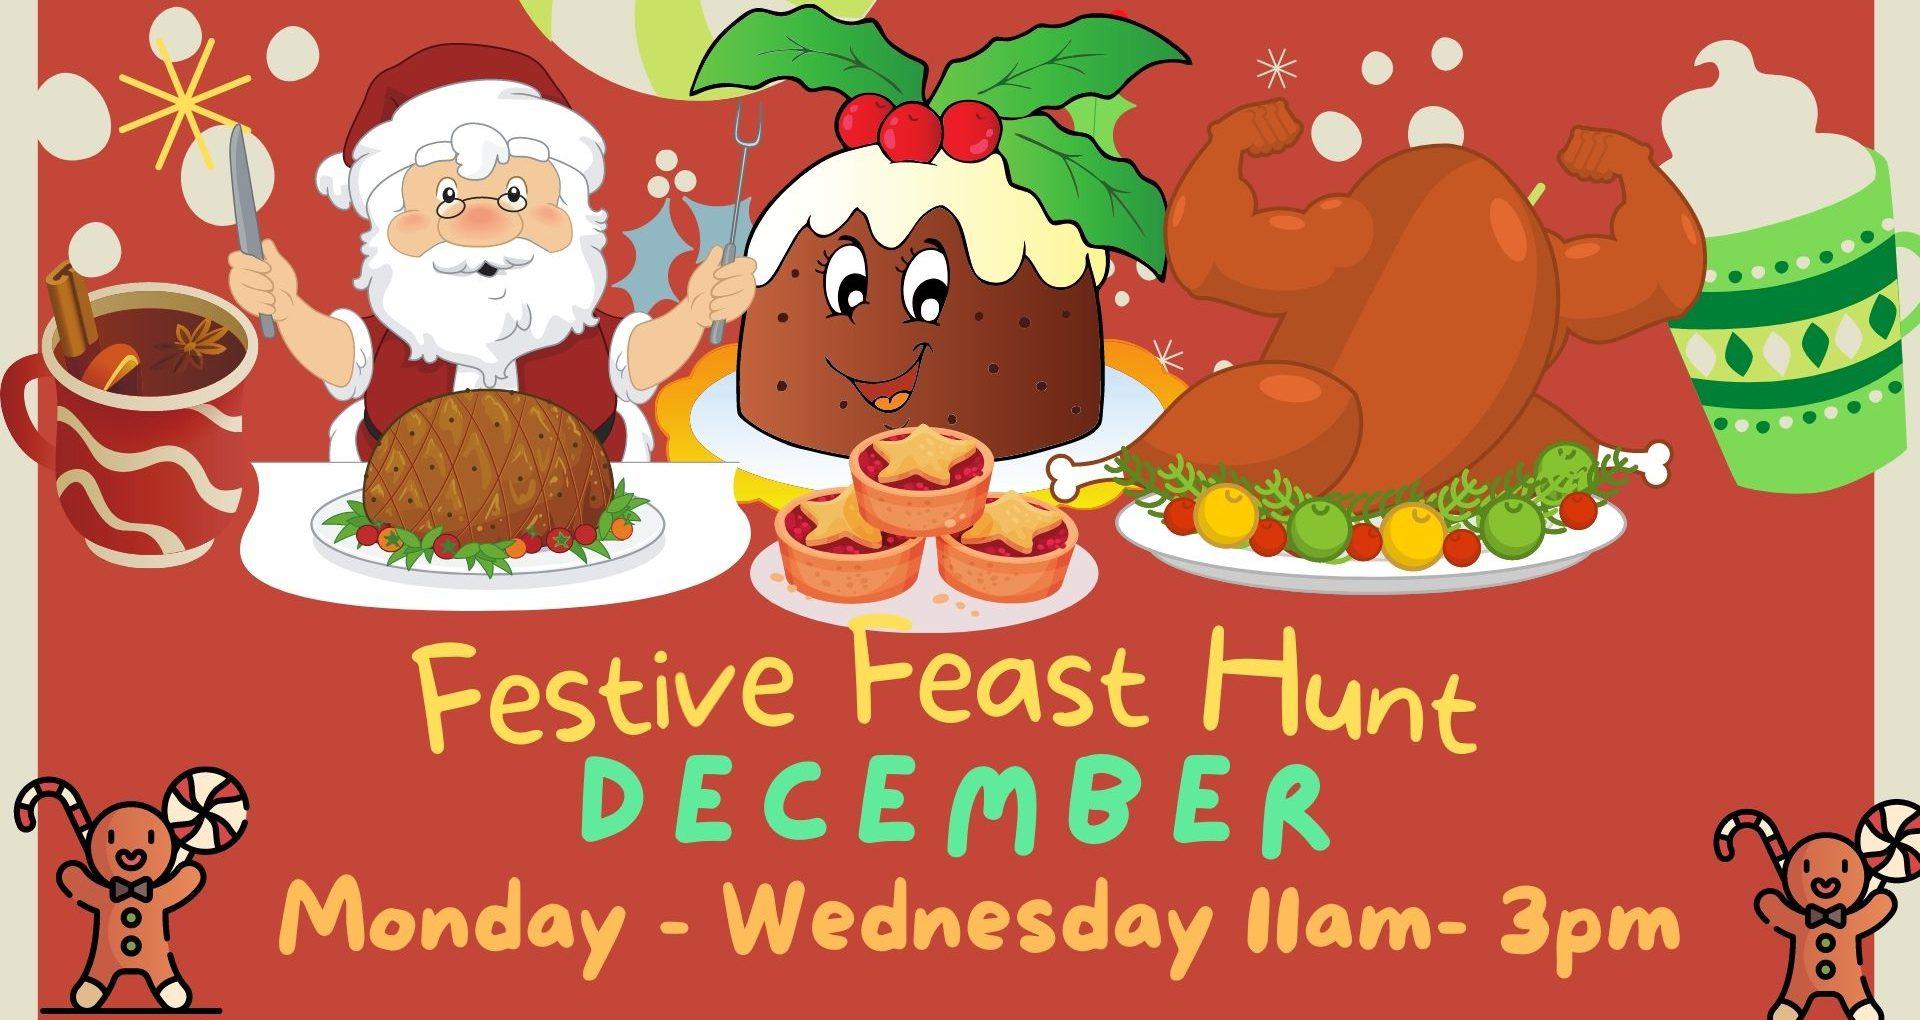 Festive Feast Hunt